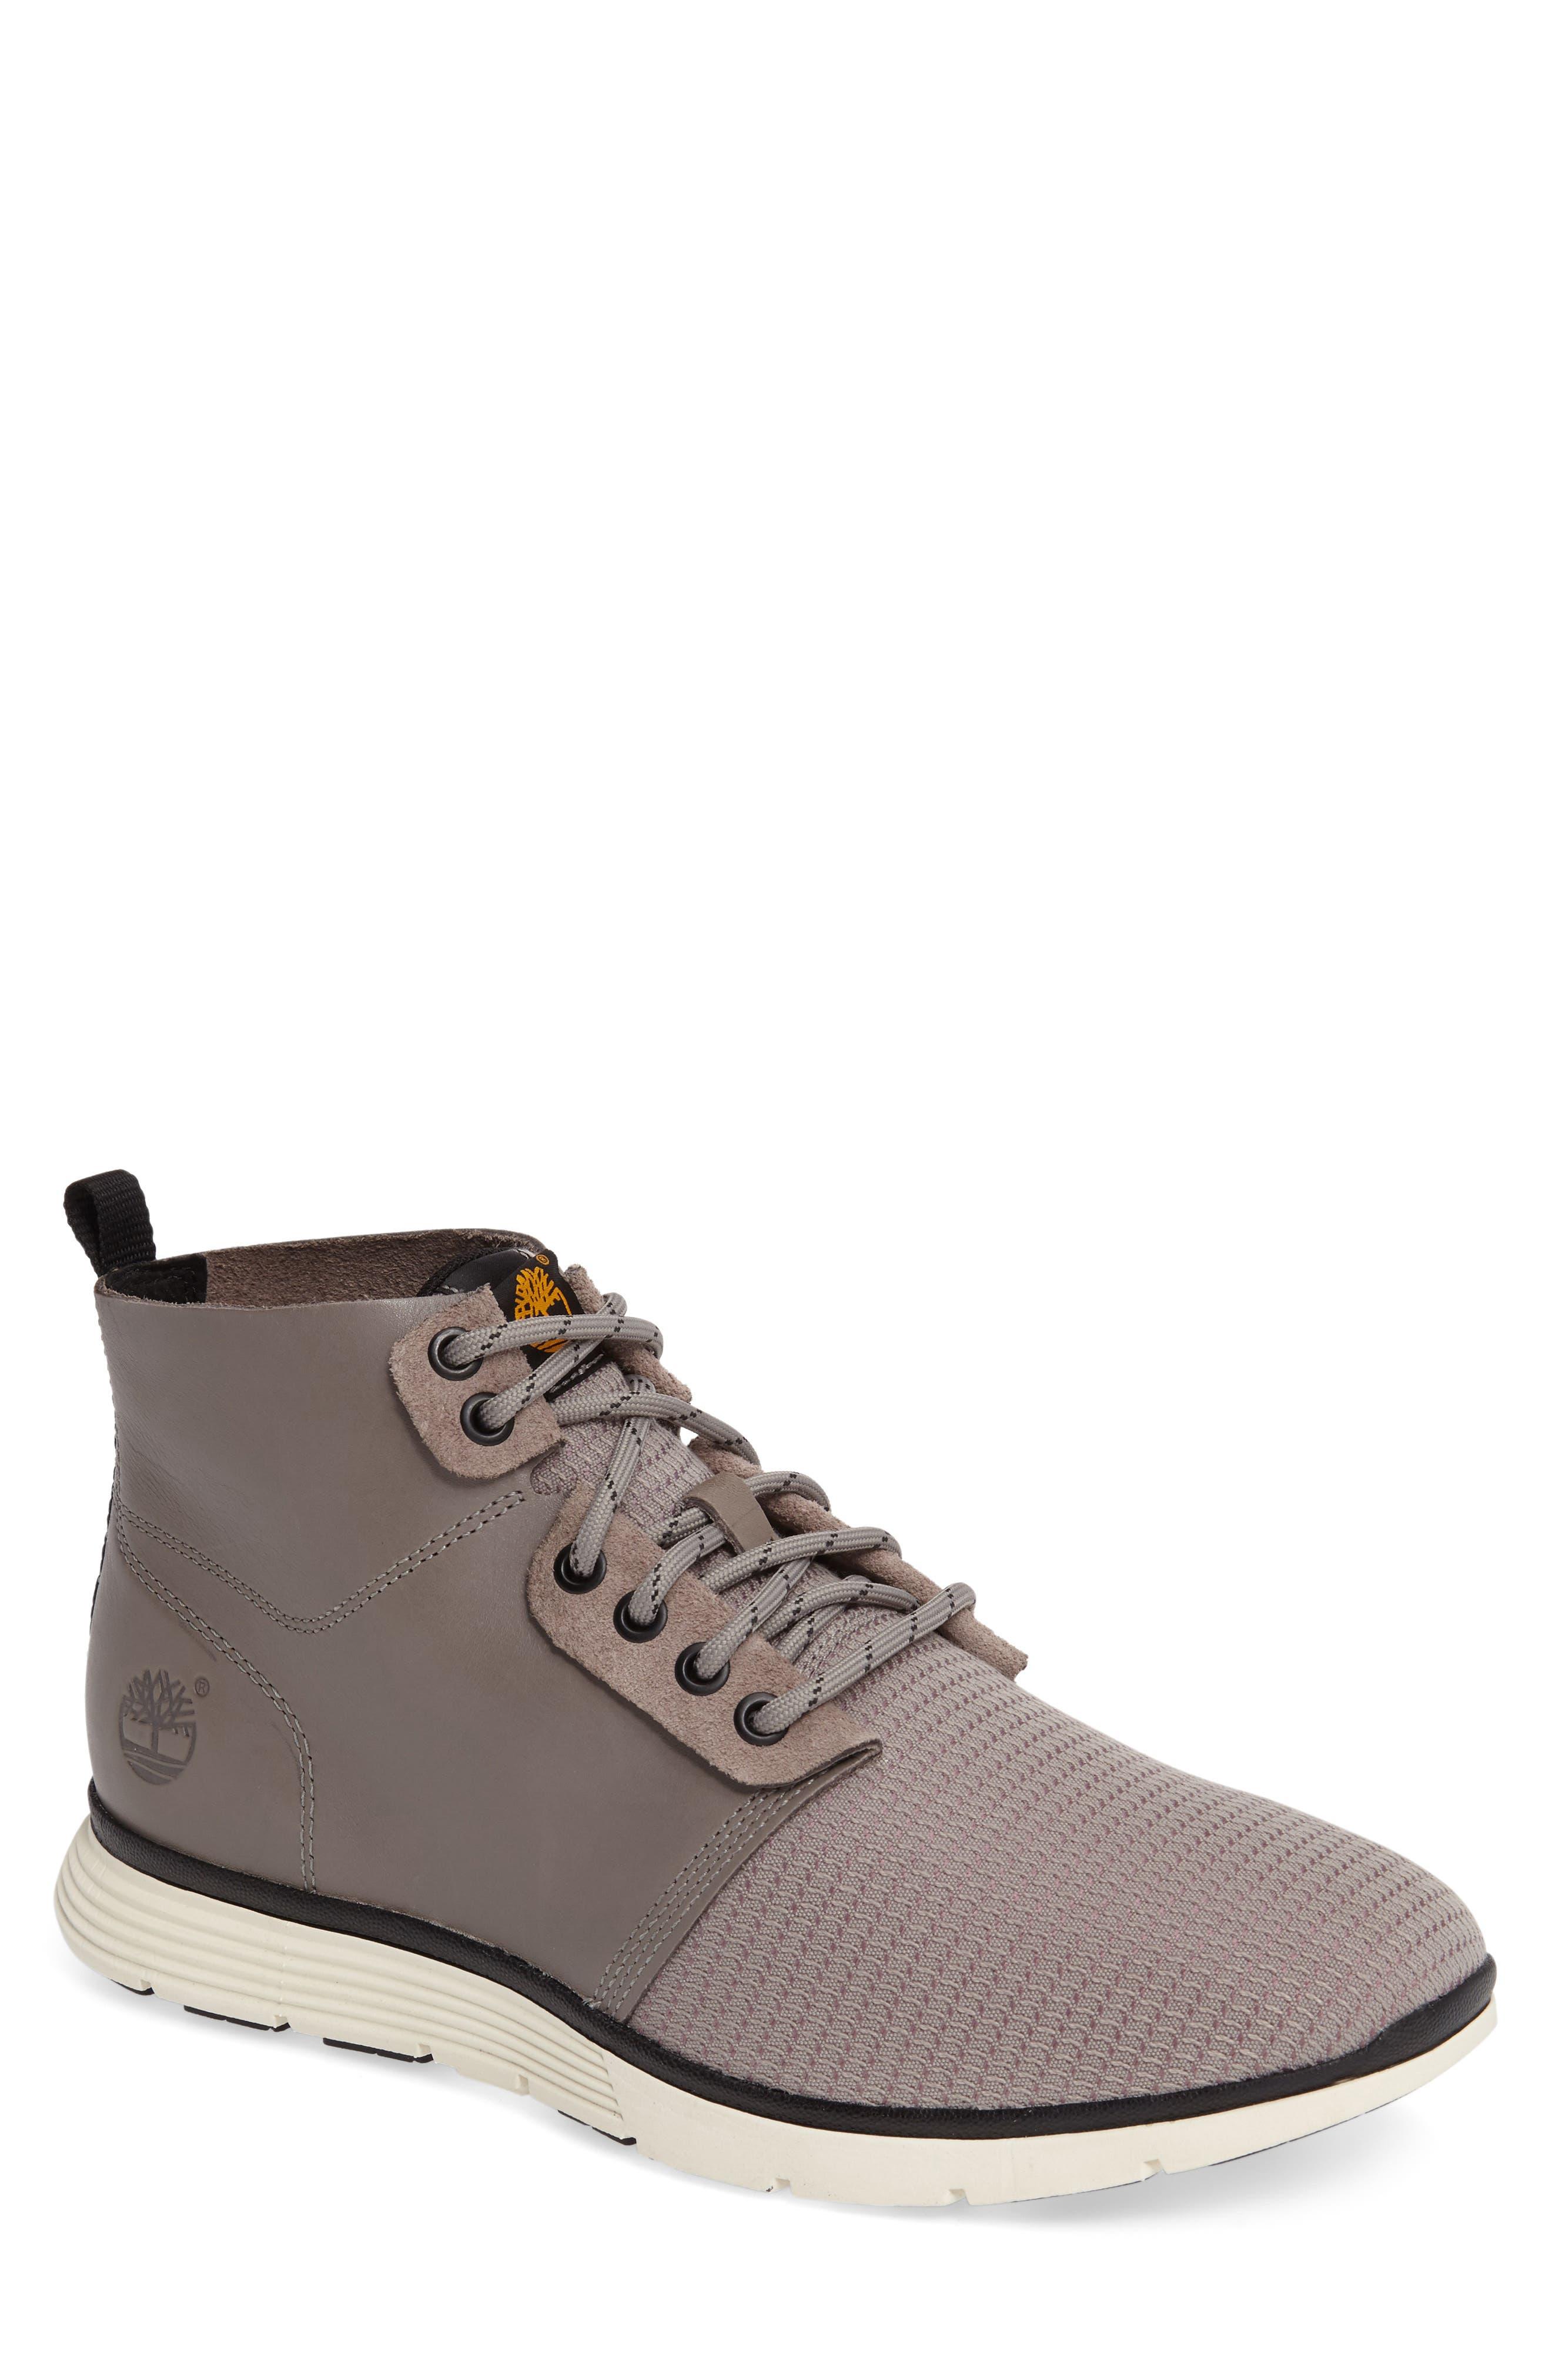 Killington Plain Toe Boot,                         Main,                         color, 030